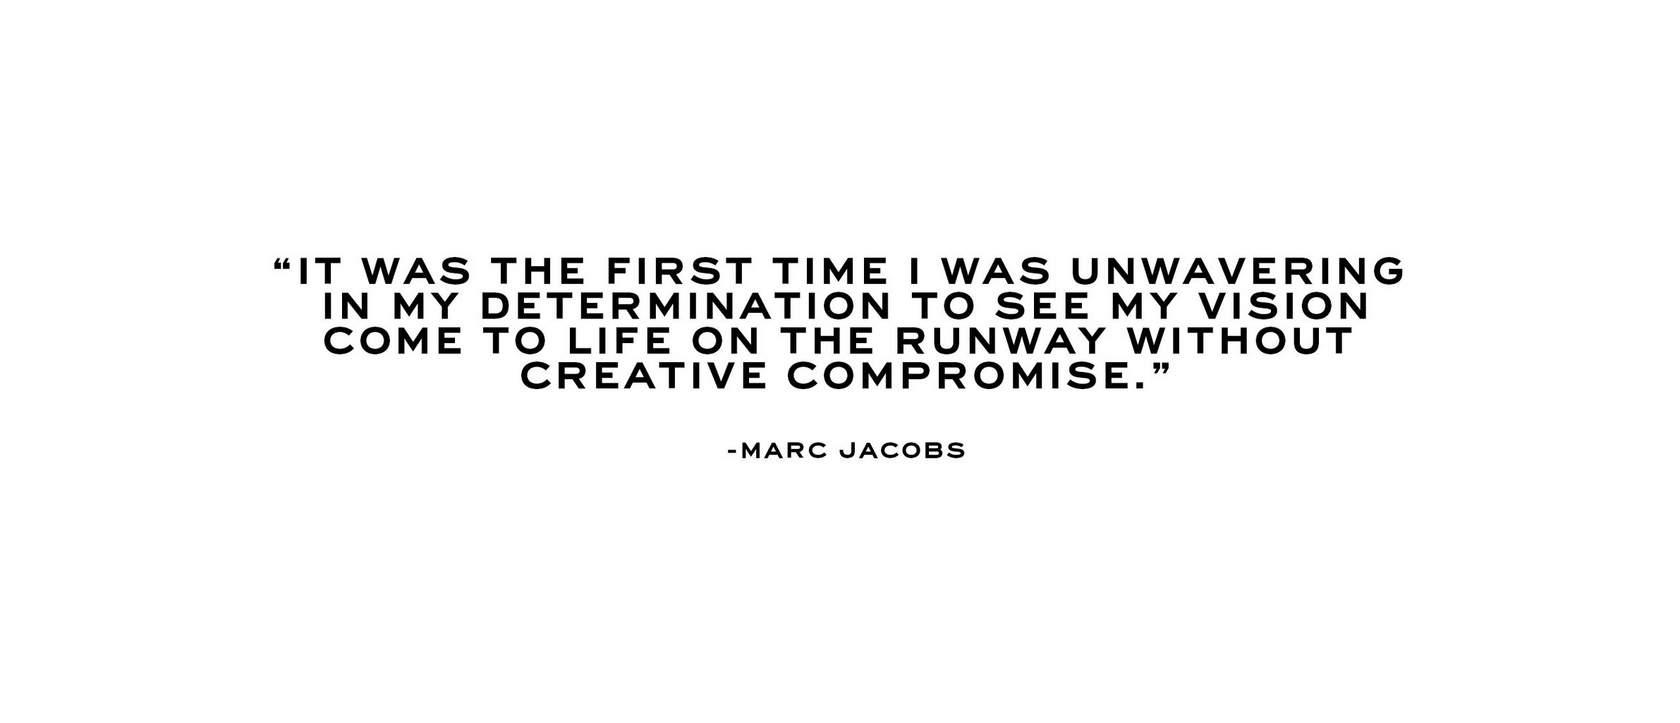 Marc Jacobs Redux Grunge 2019